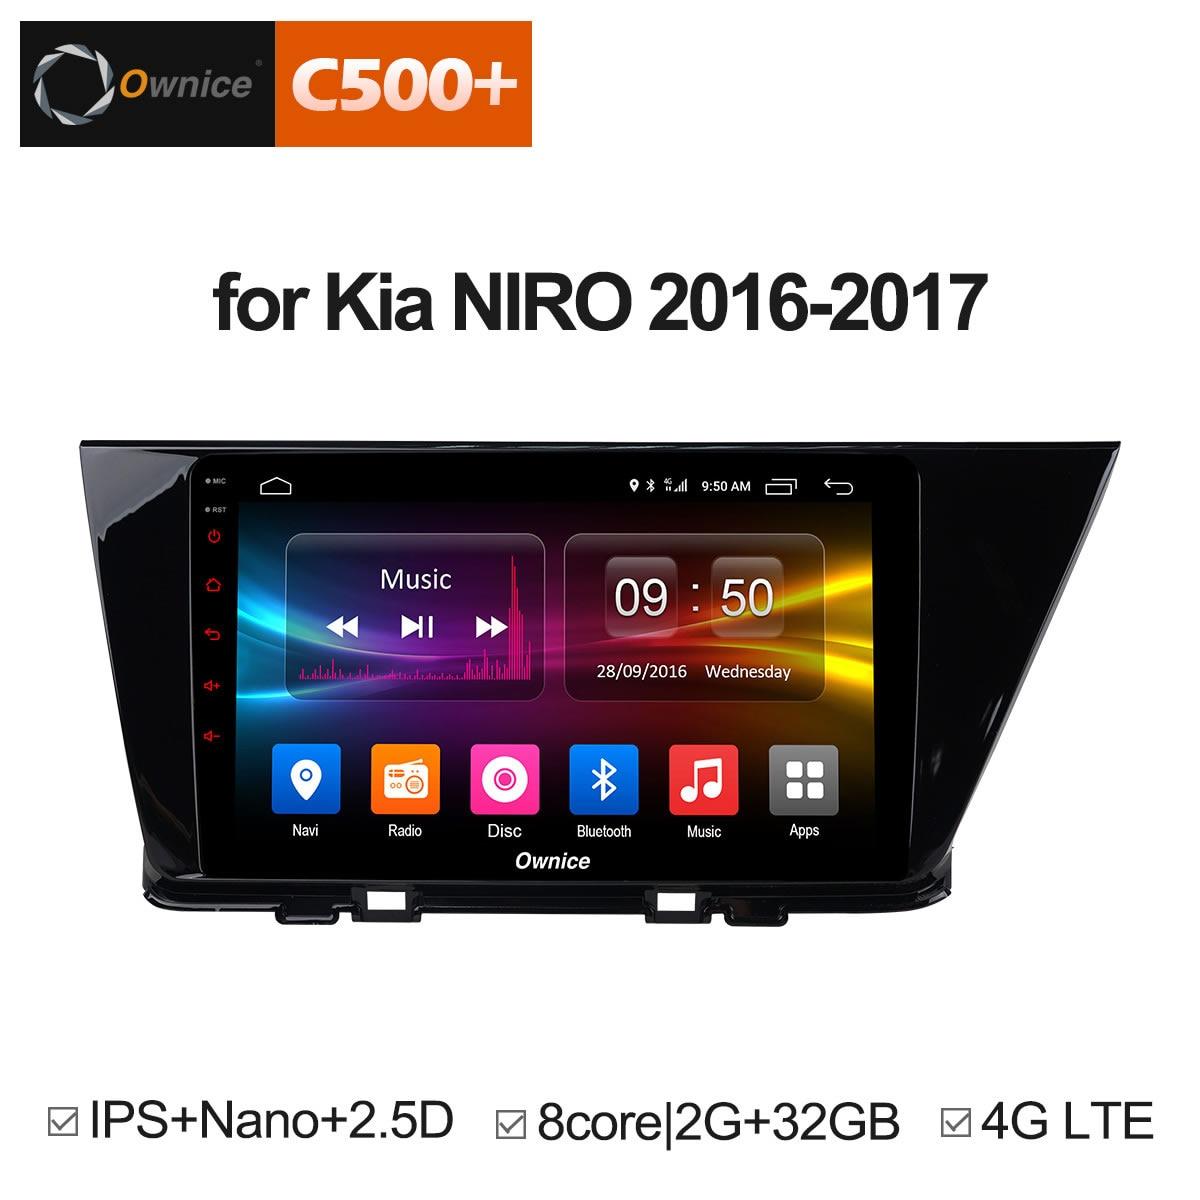 Ownice C500 + G10 Android 8.1 Octa 8 Core ROM 32g für KIA NIRO 2016 2017 Auto DVD Player Navigation GPS Radio Unterstützung 4g LTE DVR